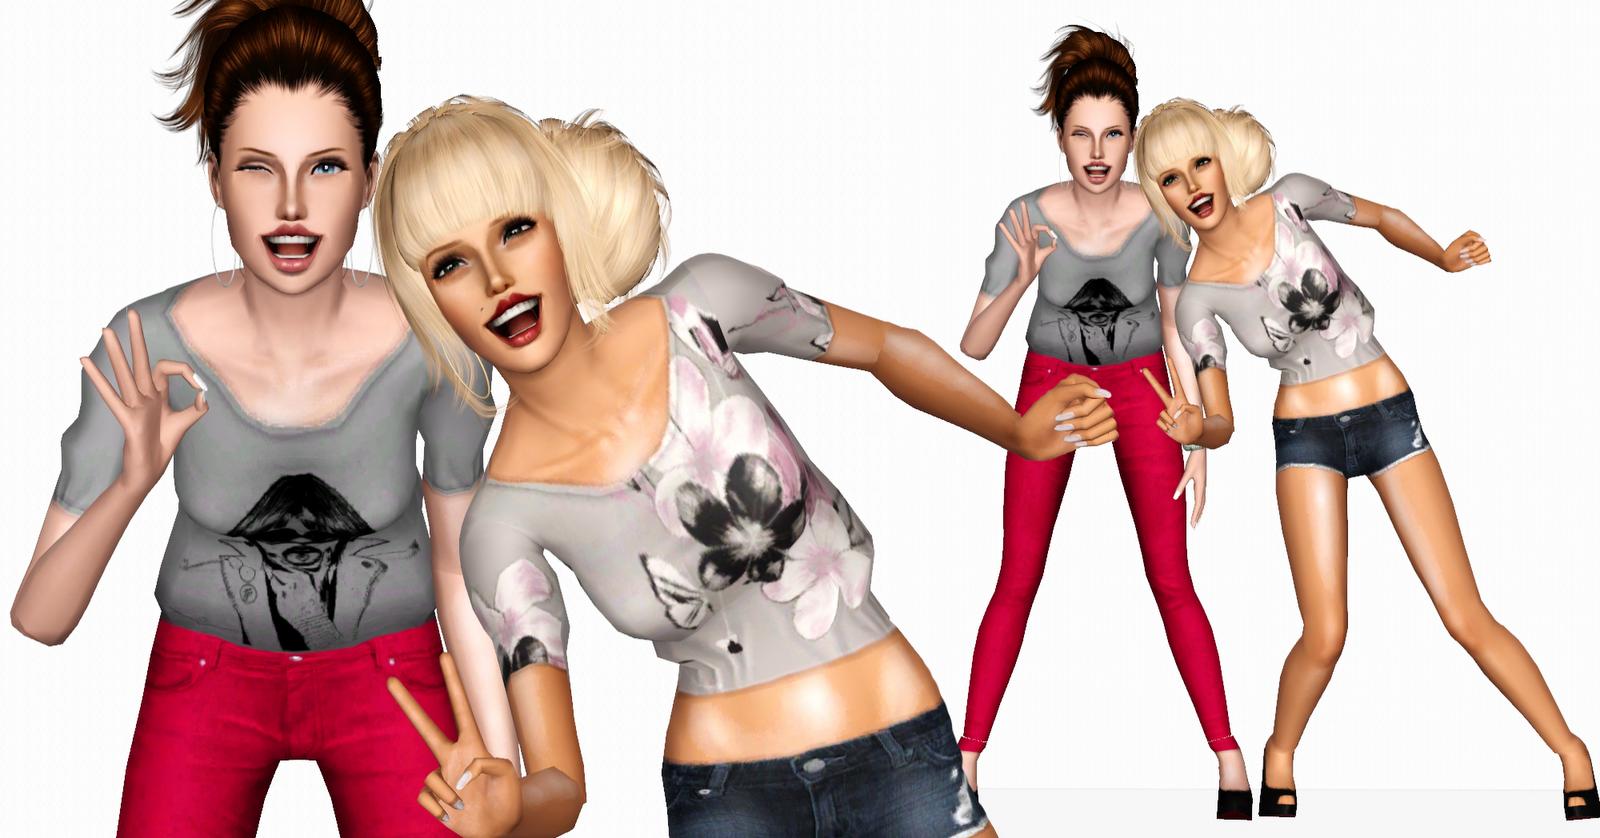 Sims 3 gangbang mod sex film